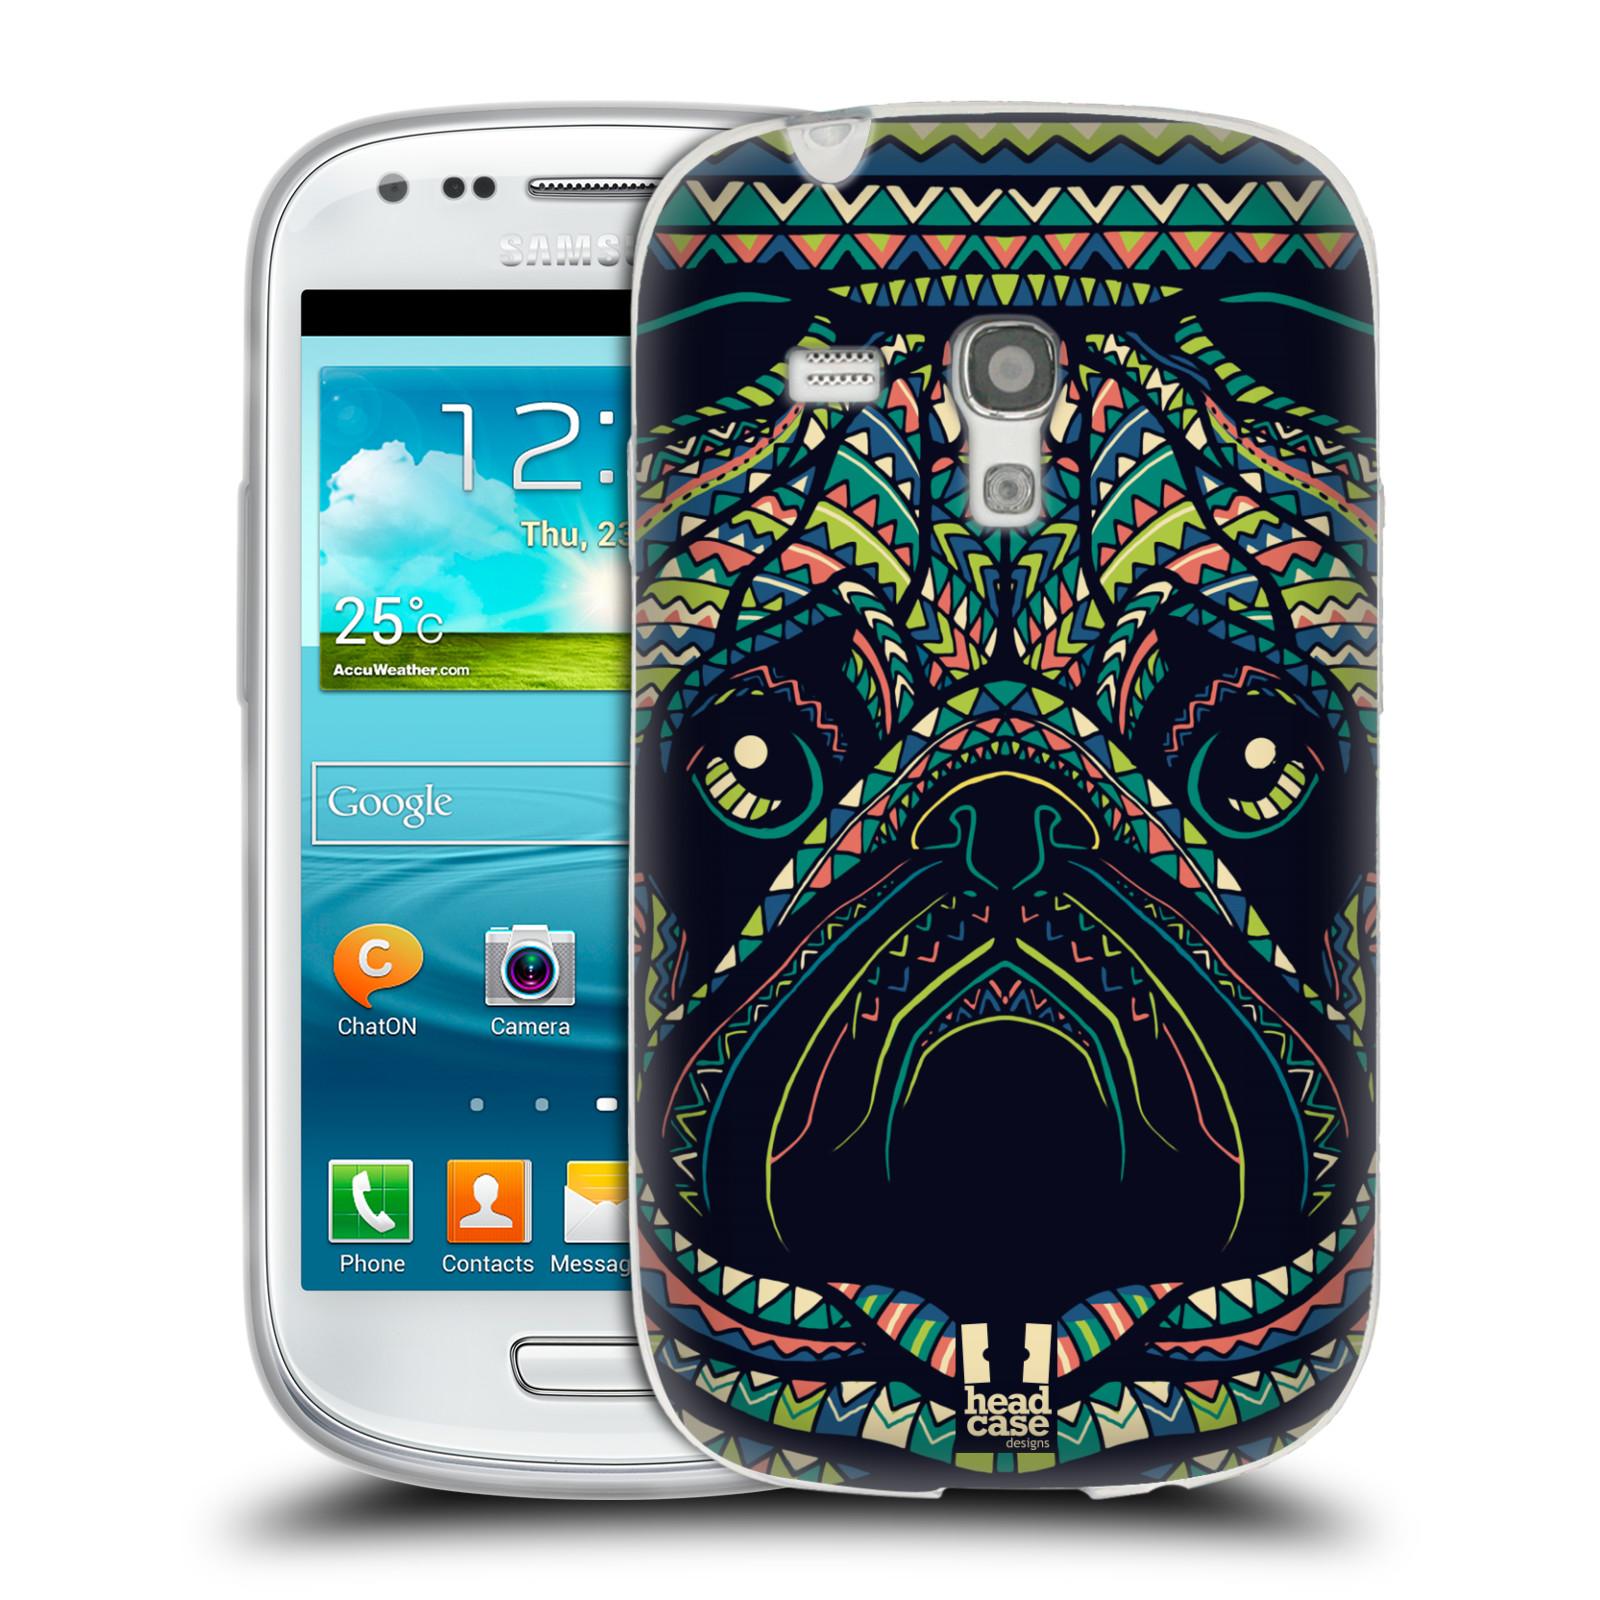 HEAD CASE silikonový obal na mobil Samsung Galaxy S3 MINI i8190 vzor Aztécký motiv zvíře 3 mopsík